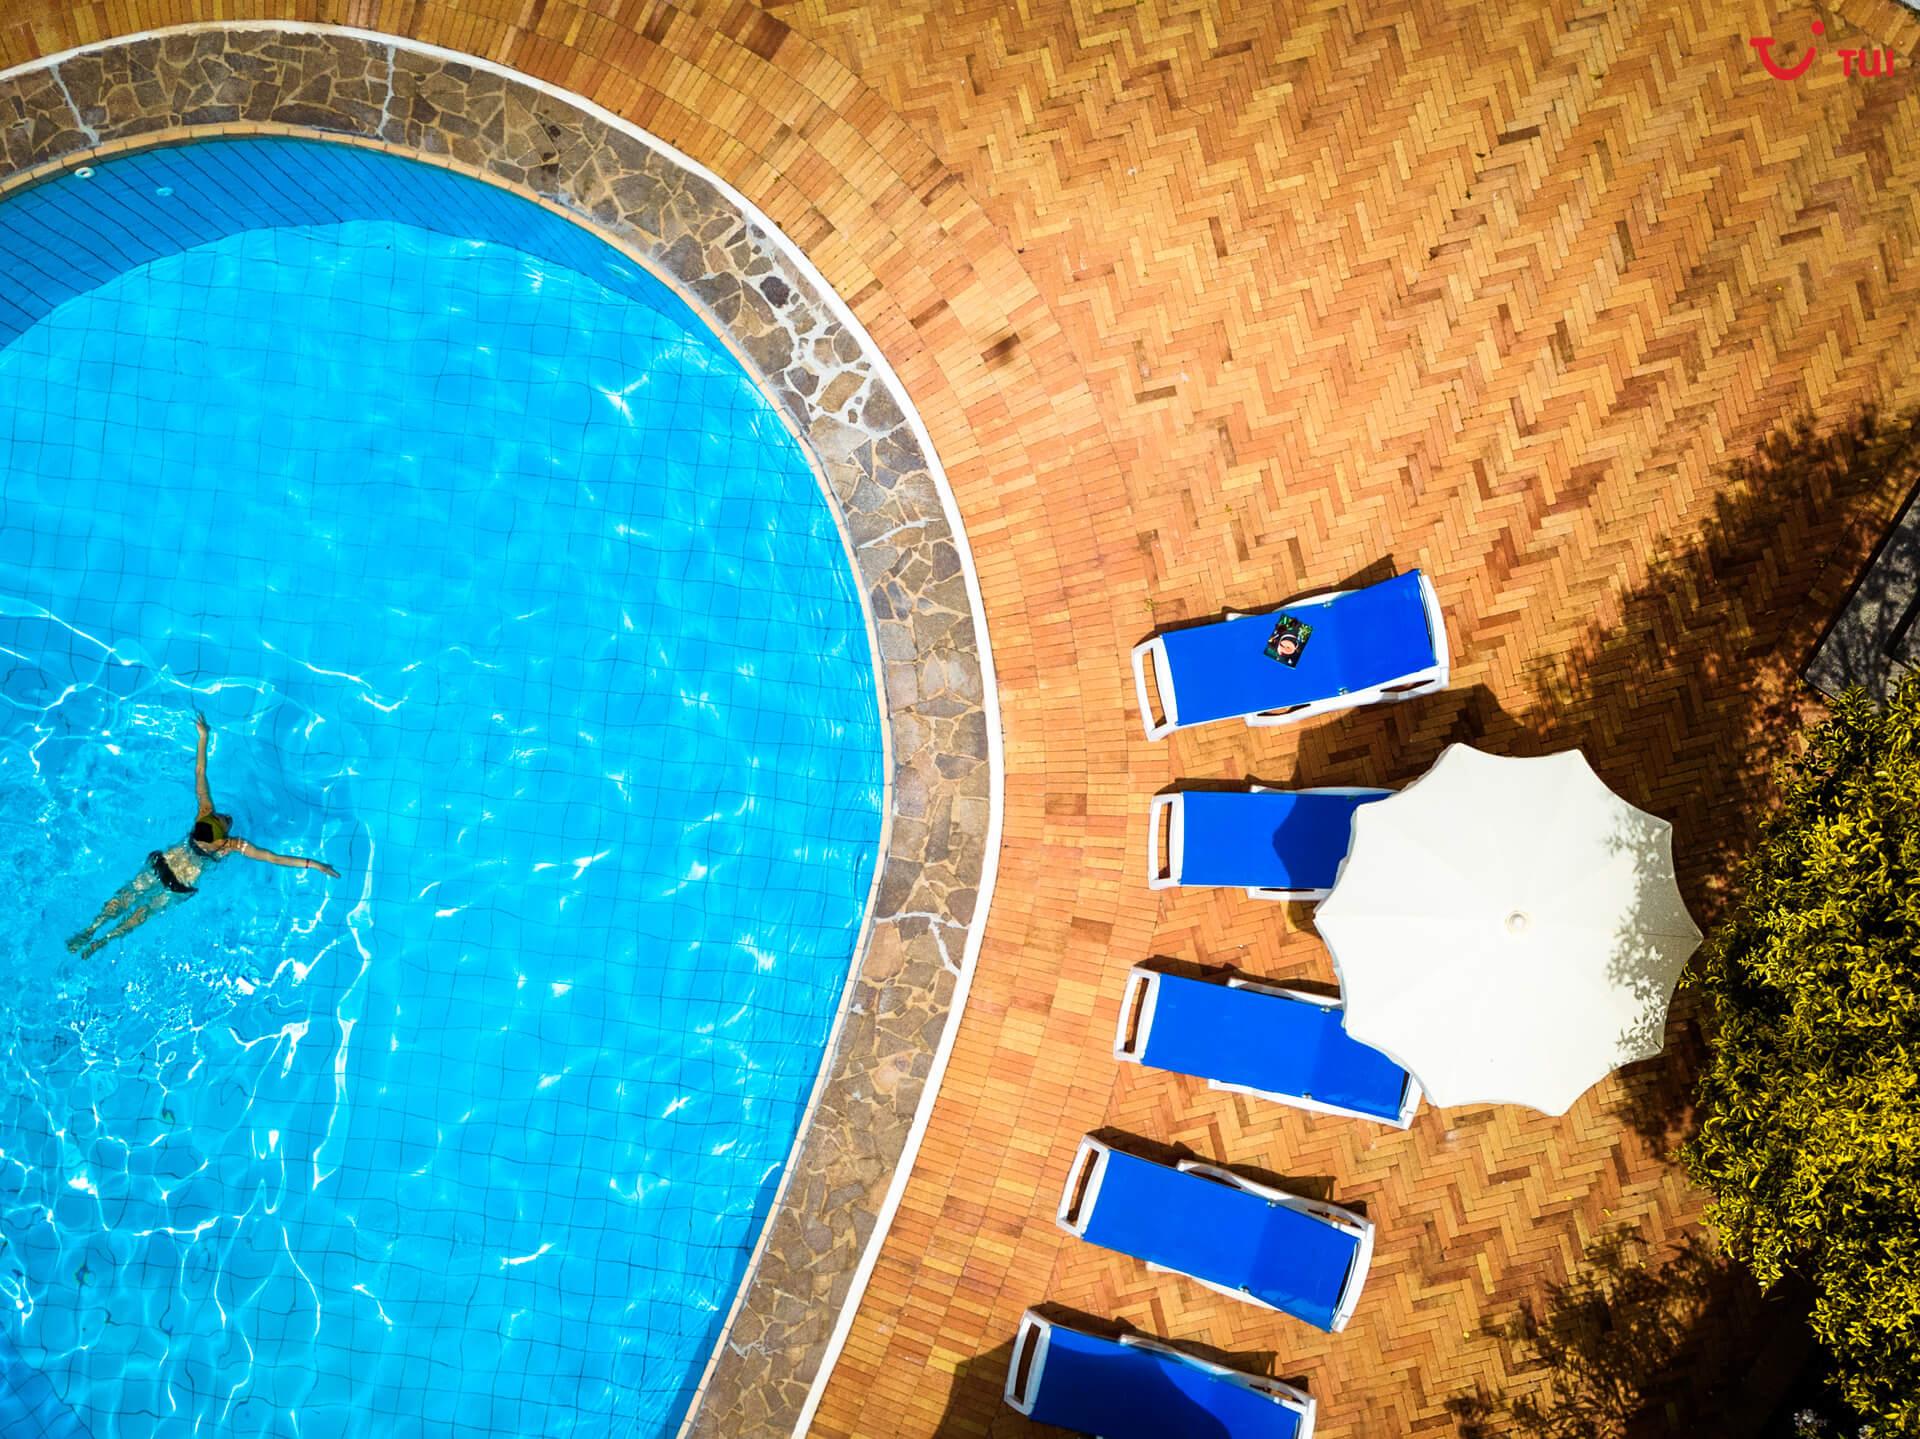 Swimmingpool von oben